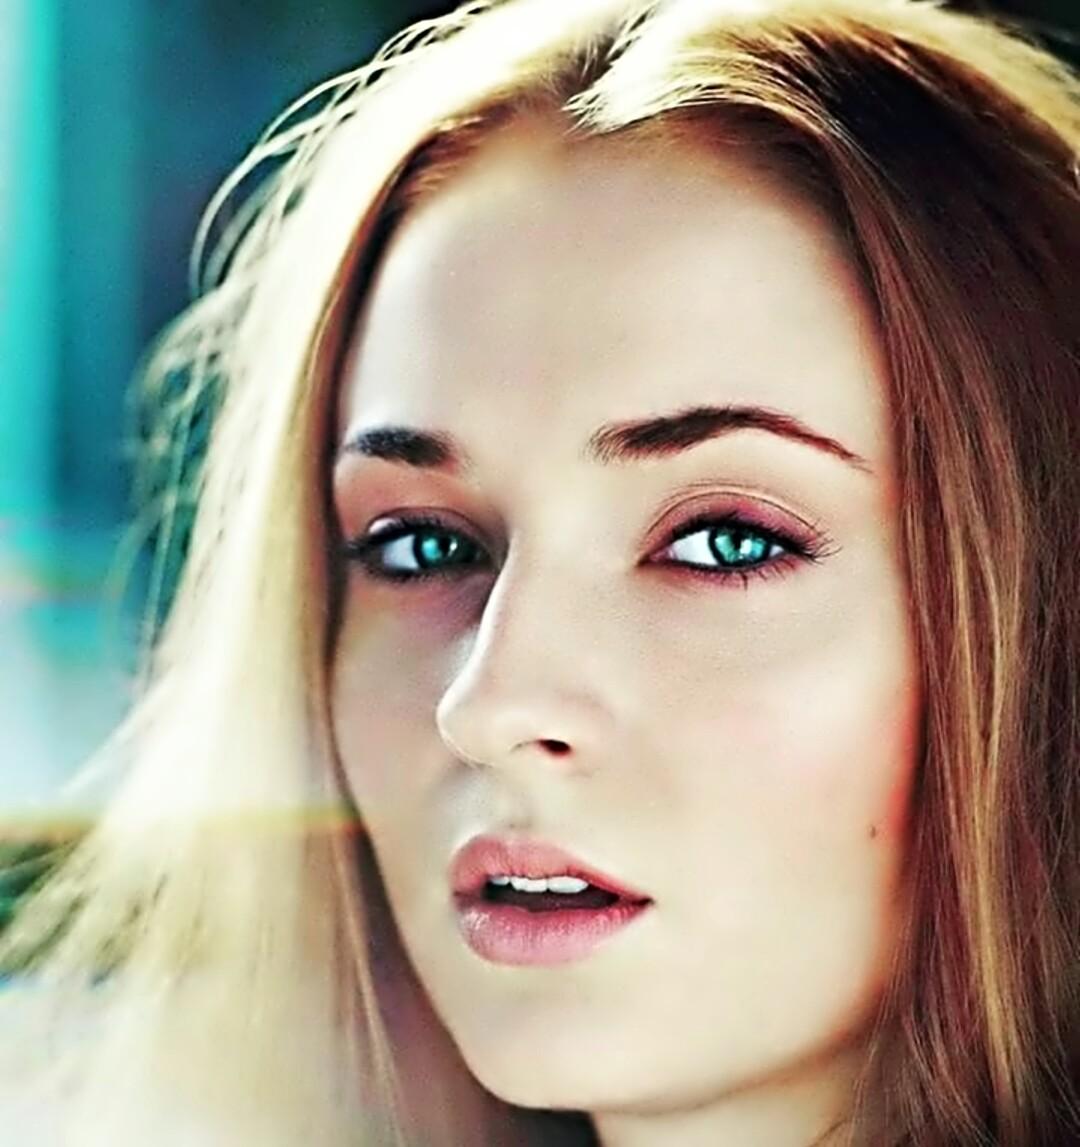 Sophie Turner Hot pics